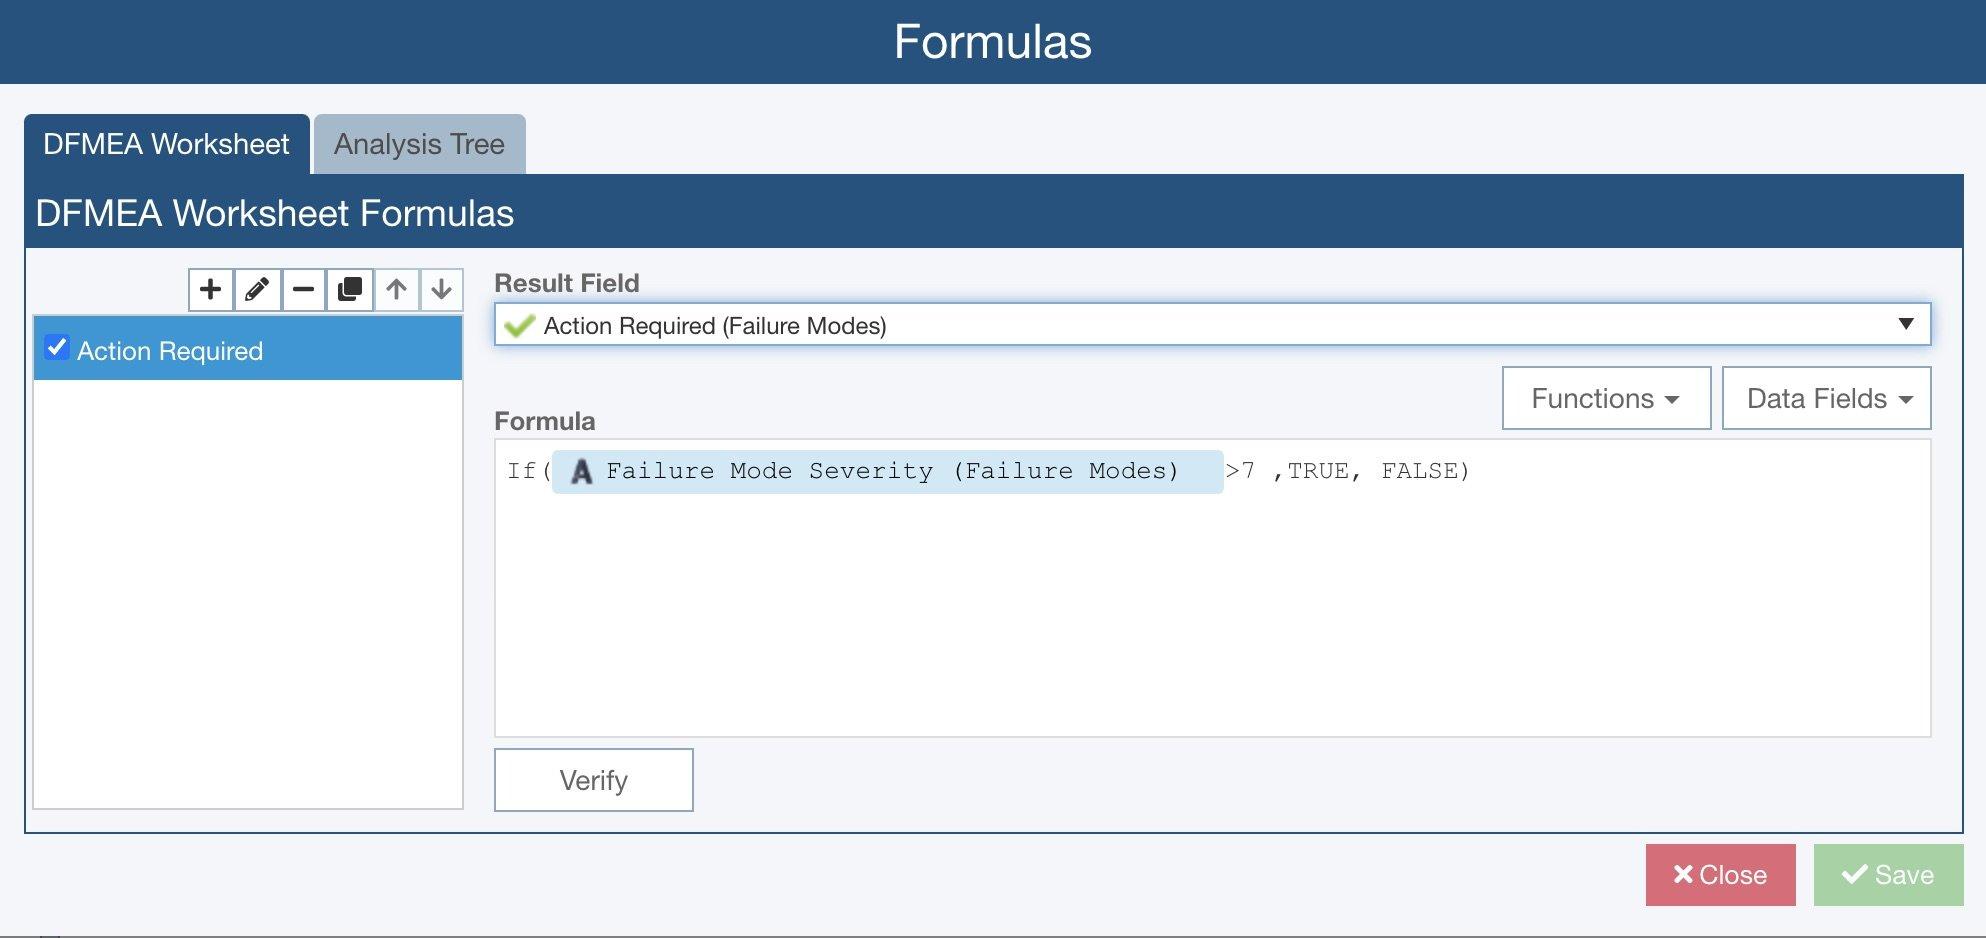 Relyence FMEA Formulas